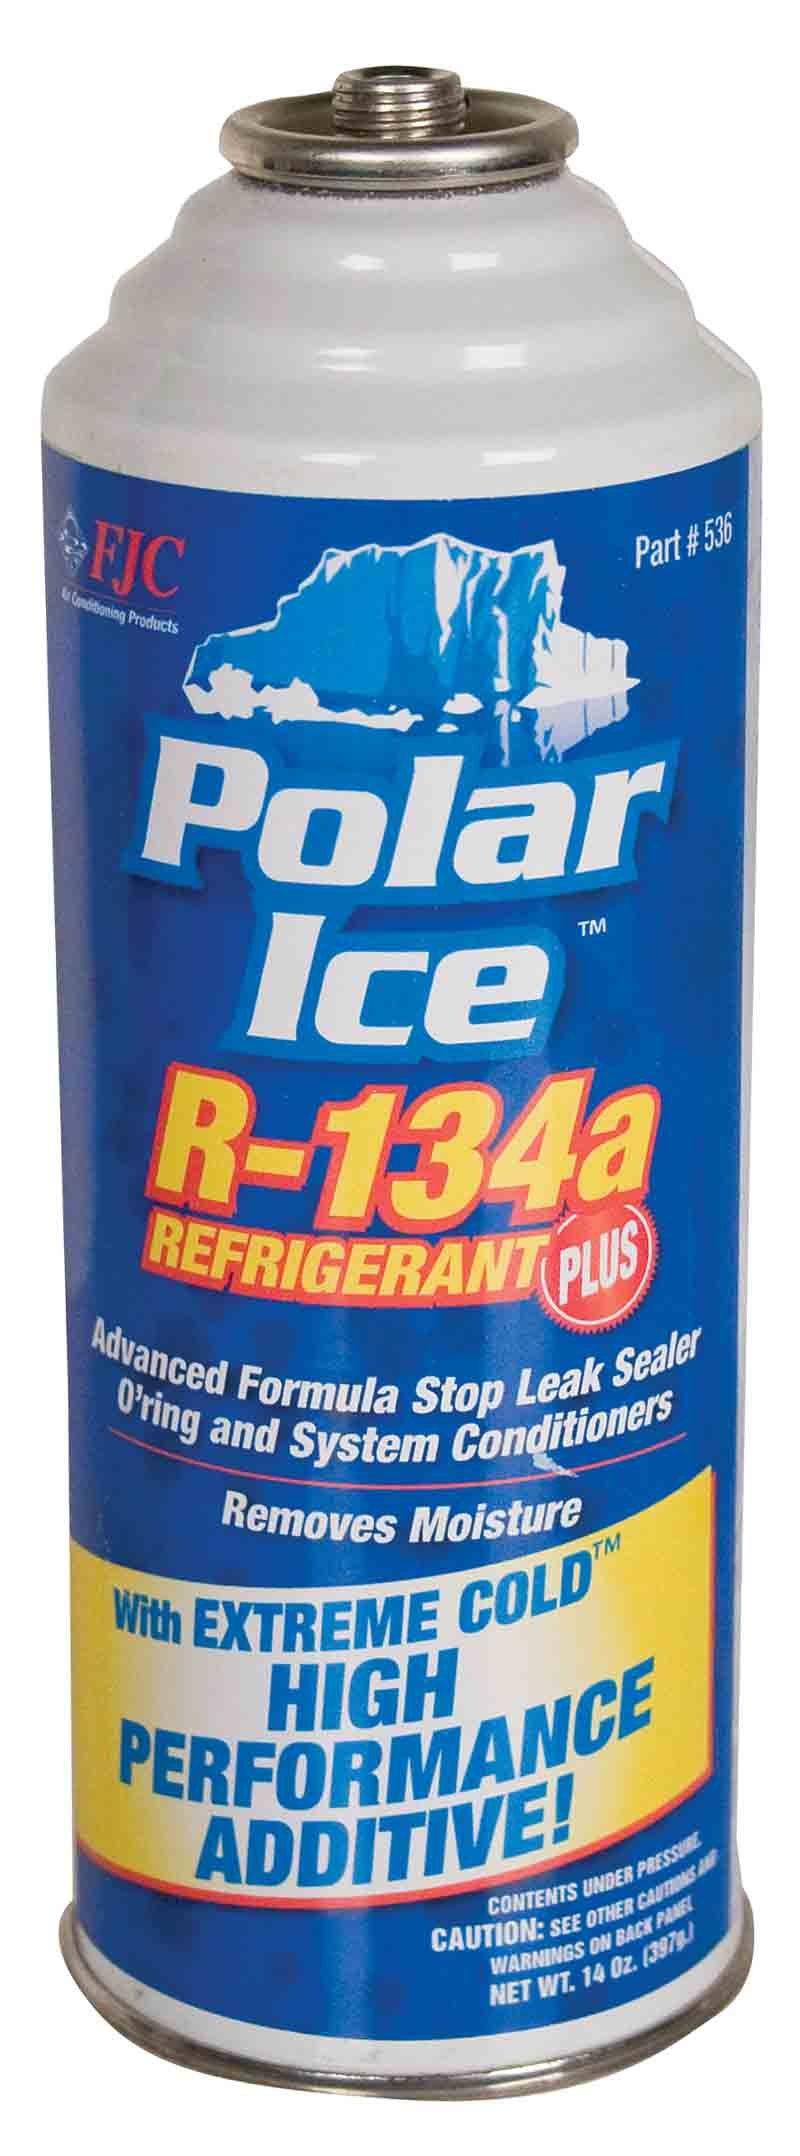 FJC 536 Refrigerant - 14 oz.